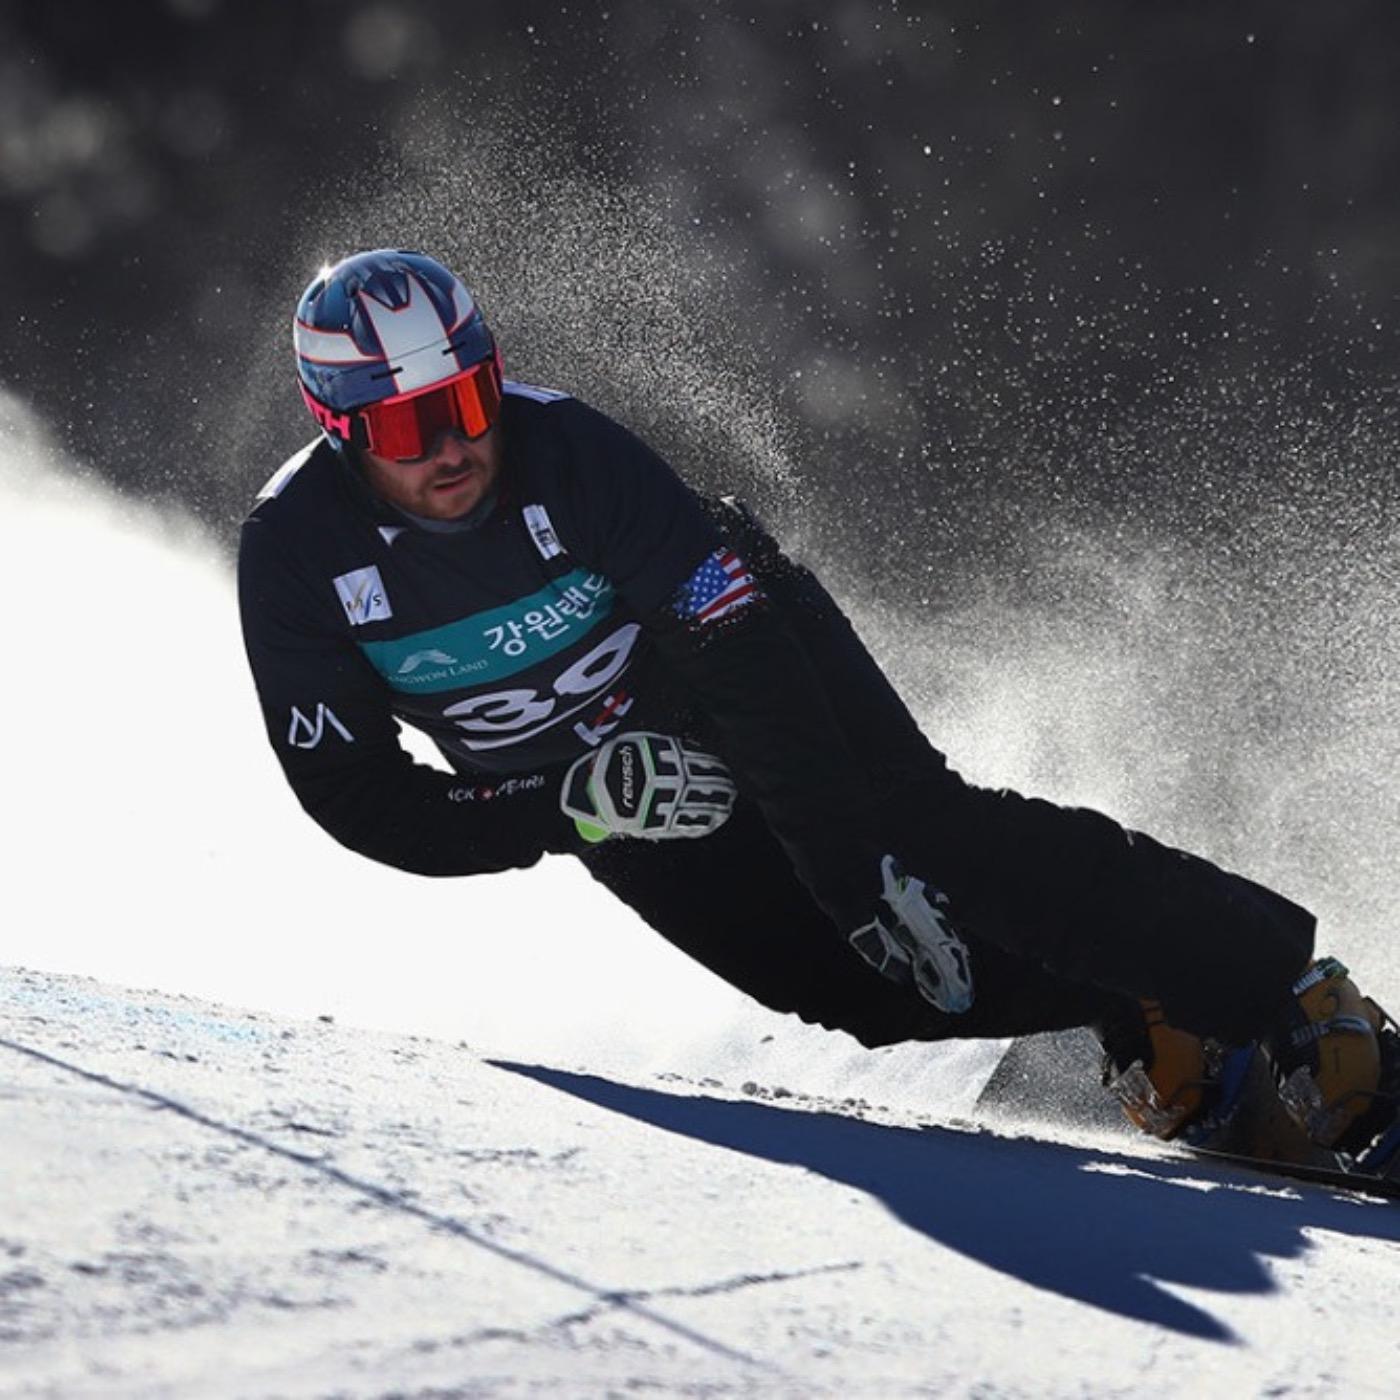 An Olympic Snowboarder & IMSA Driver: Talking with AJ Muss